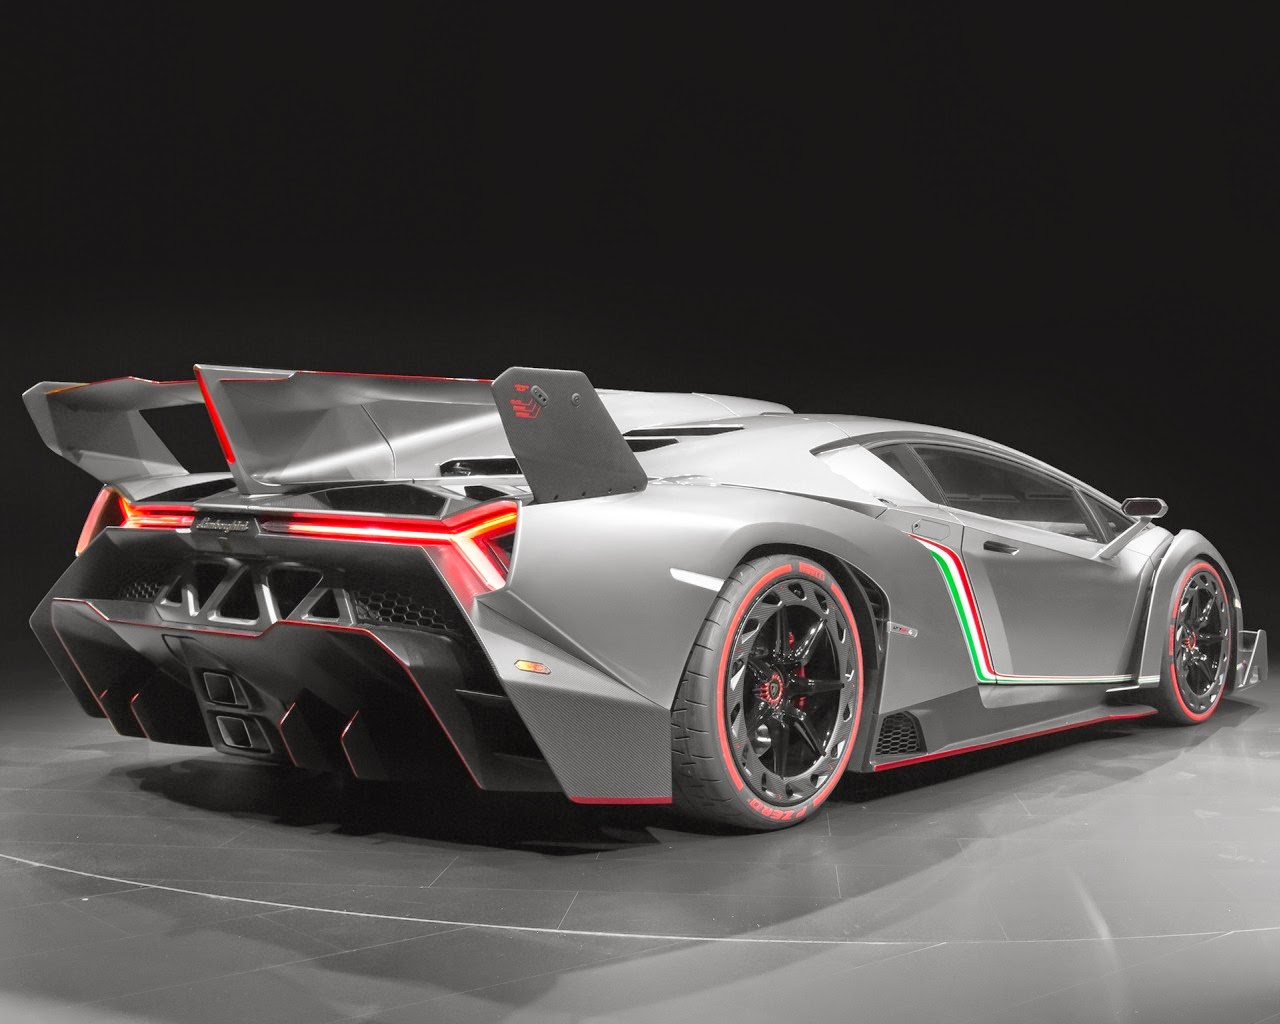 Lamborghini veneno wallpapers best lamborghini veneno - Lamborghini veneno wallpaper android ...